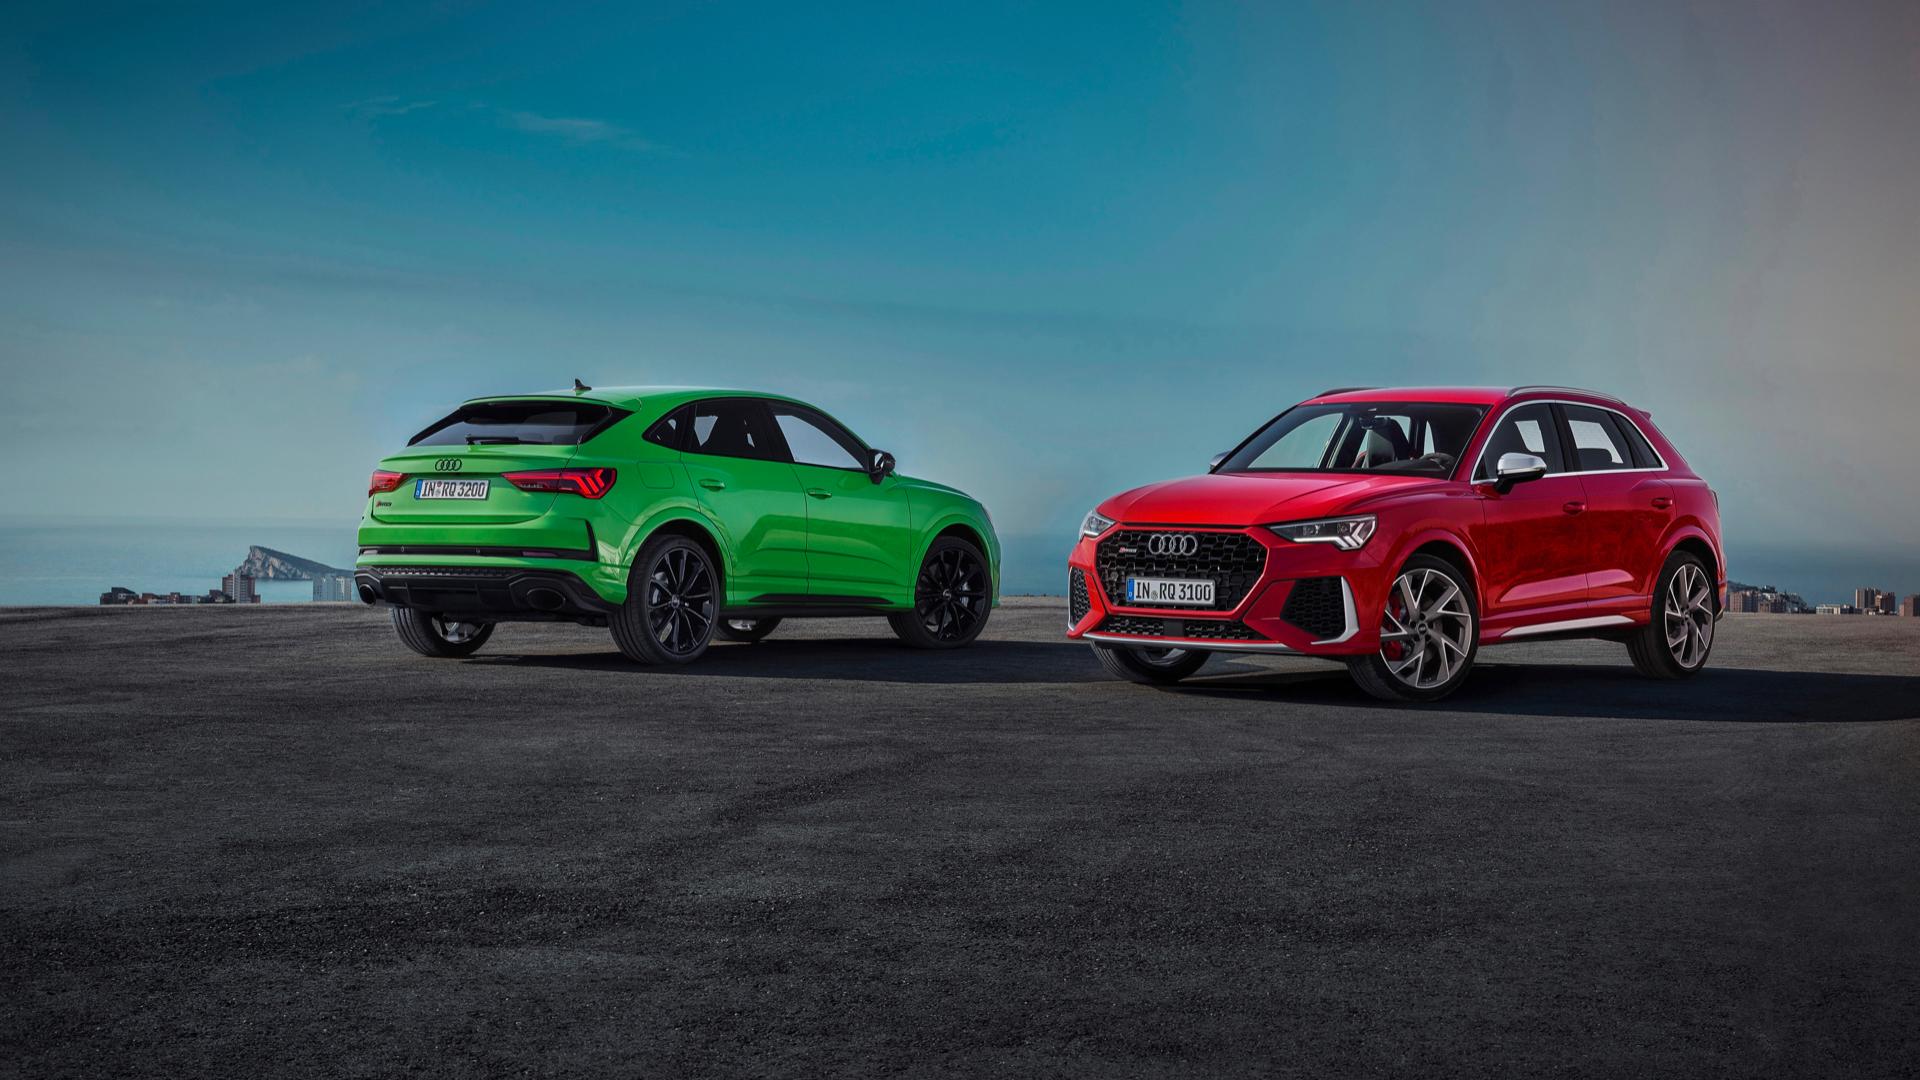 Audi RS Q3 und RS Q3 Sportback (Trailer)